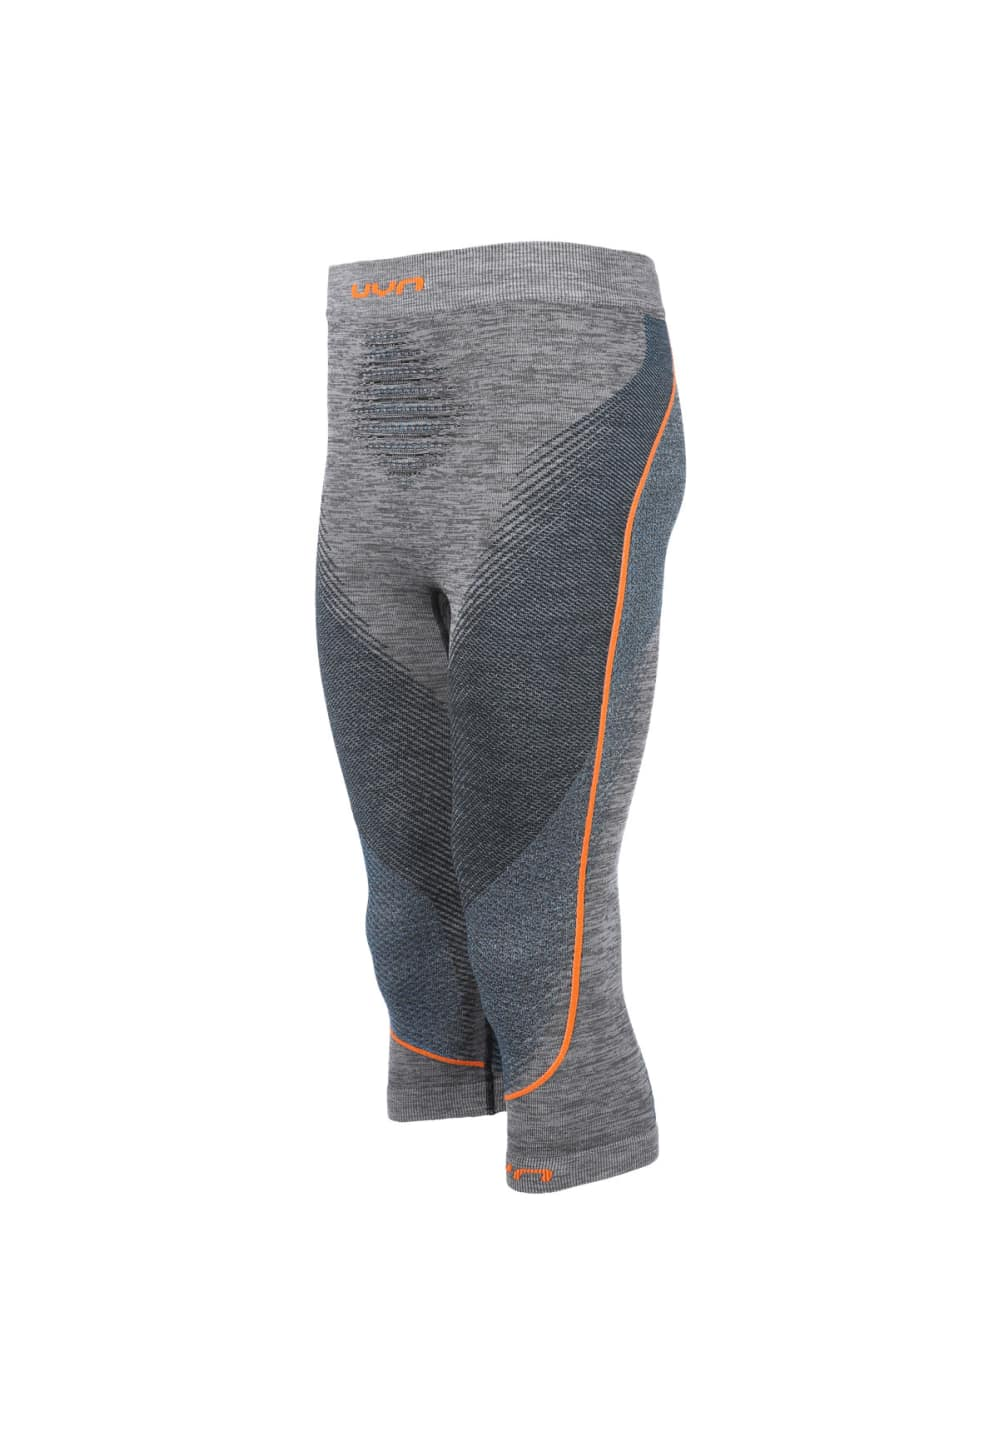 UYN Ambityon Uw Pants Medium Melange - Laufhosen für Herren - Grau